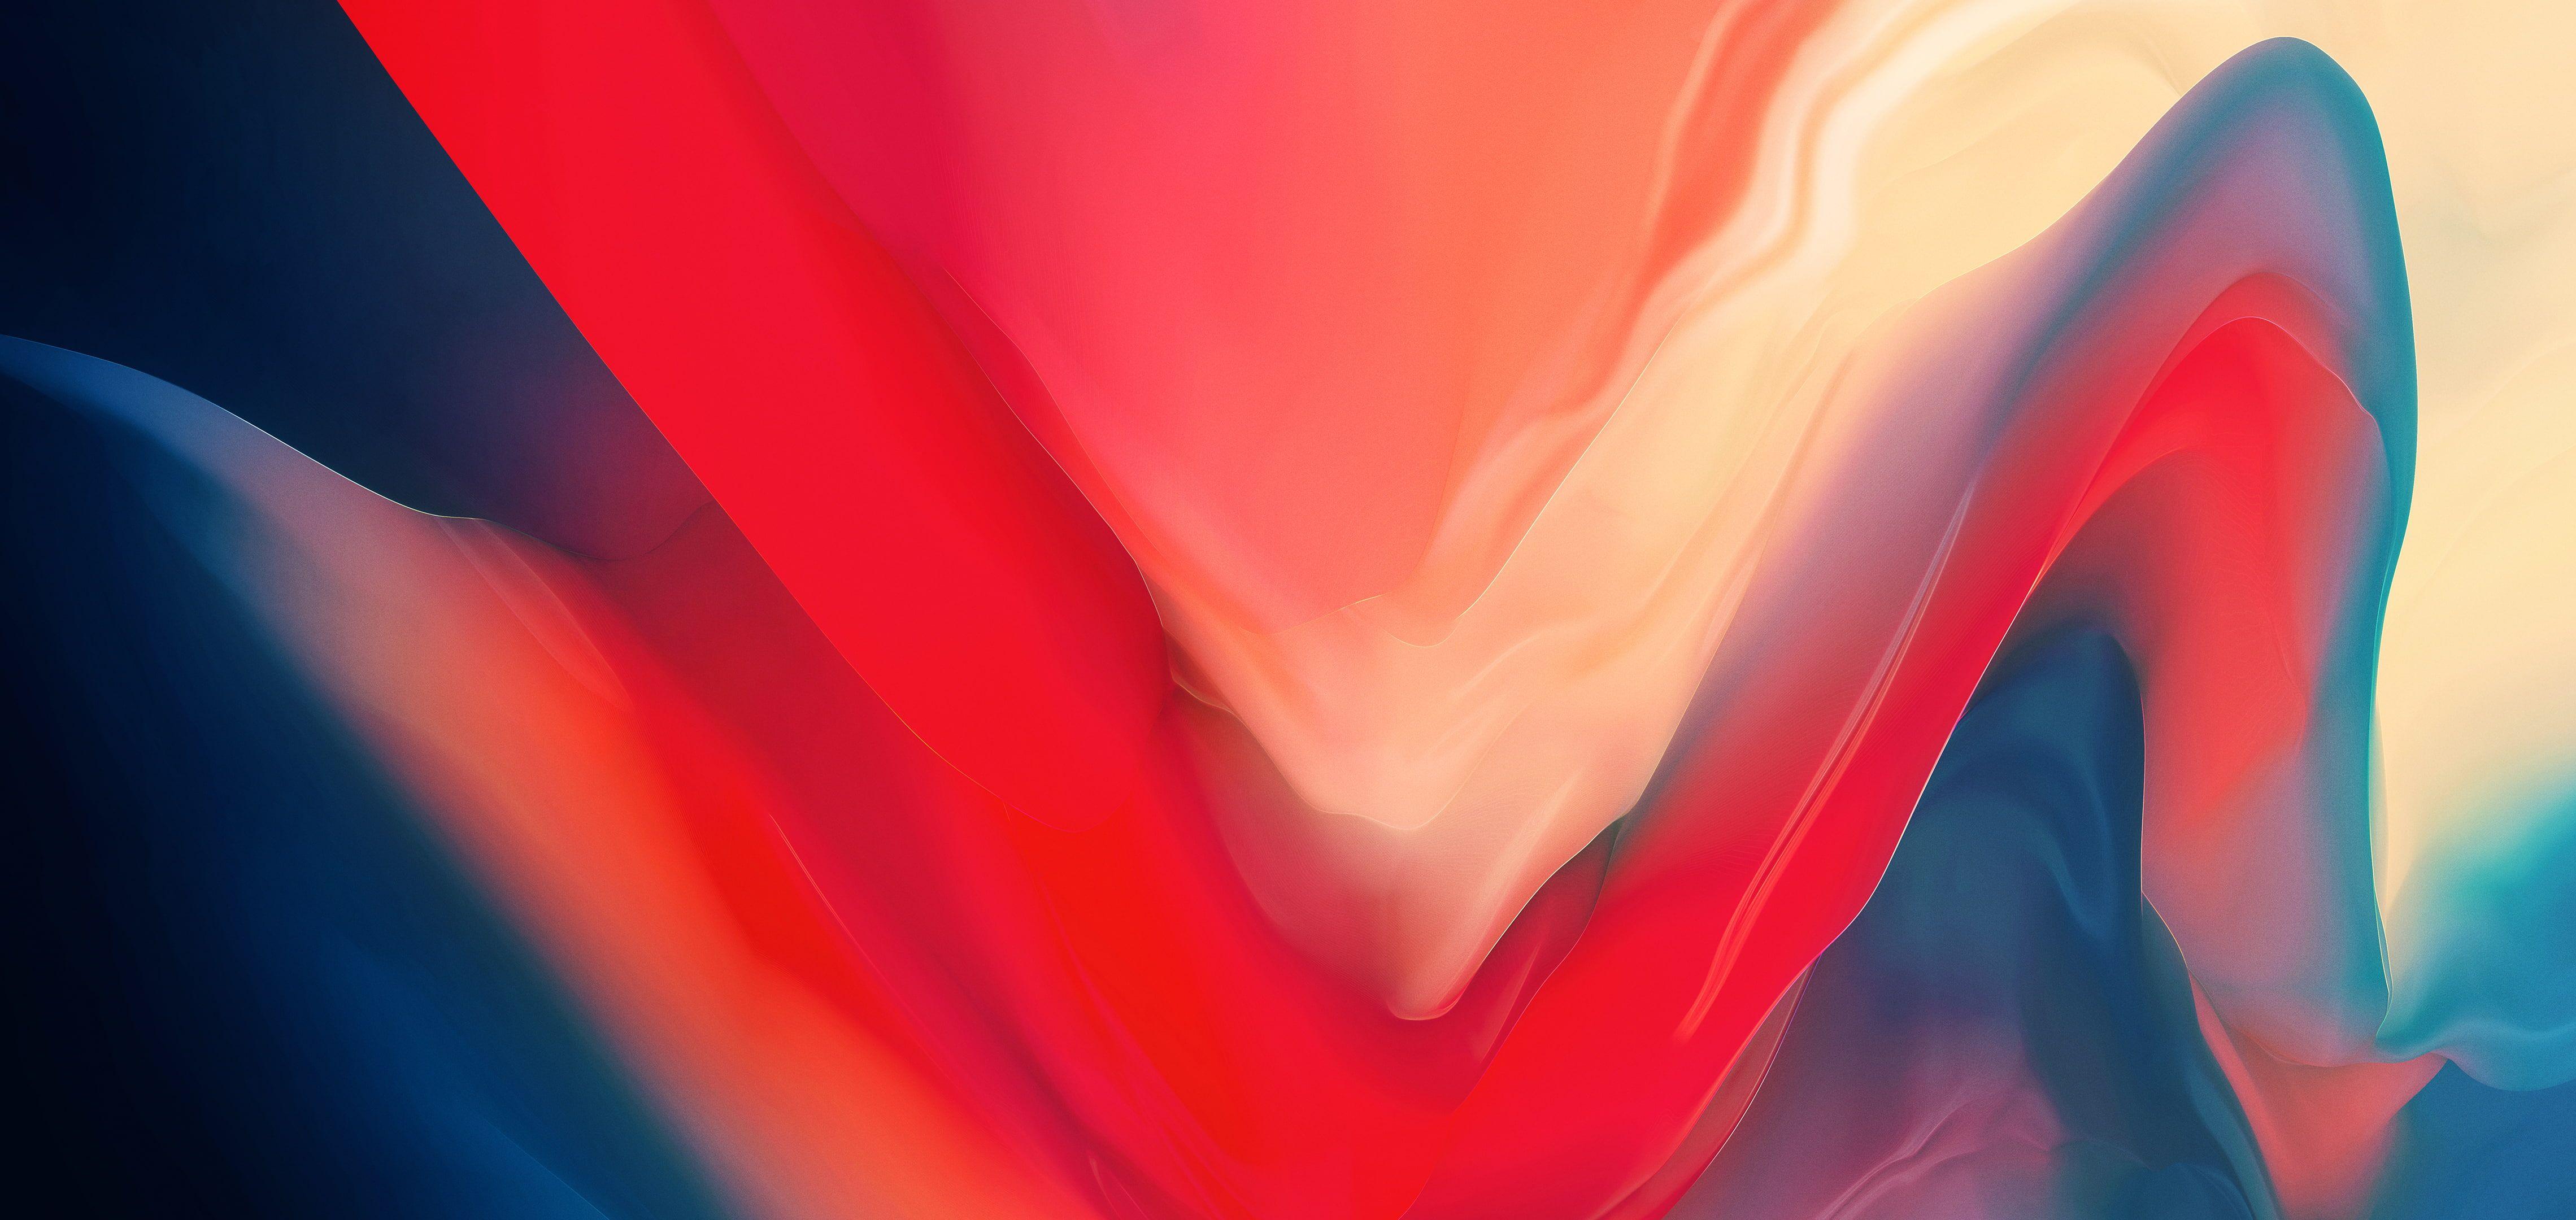 Colorful Gradients Oneplus 6 Stock 4k 4k Wallpaper Hdwallpaper Desktop Iphone Wallpaper Wallpaper Android Wallpaper